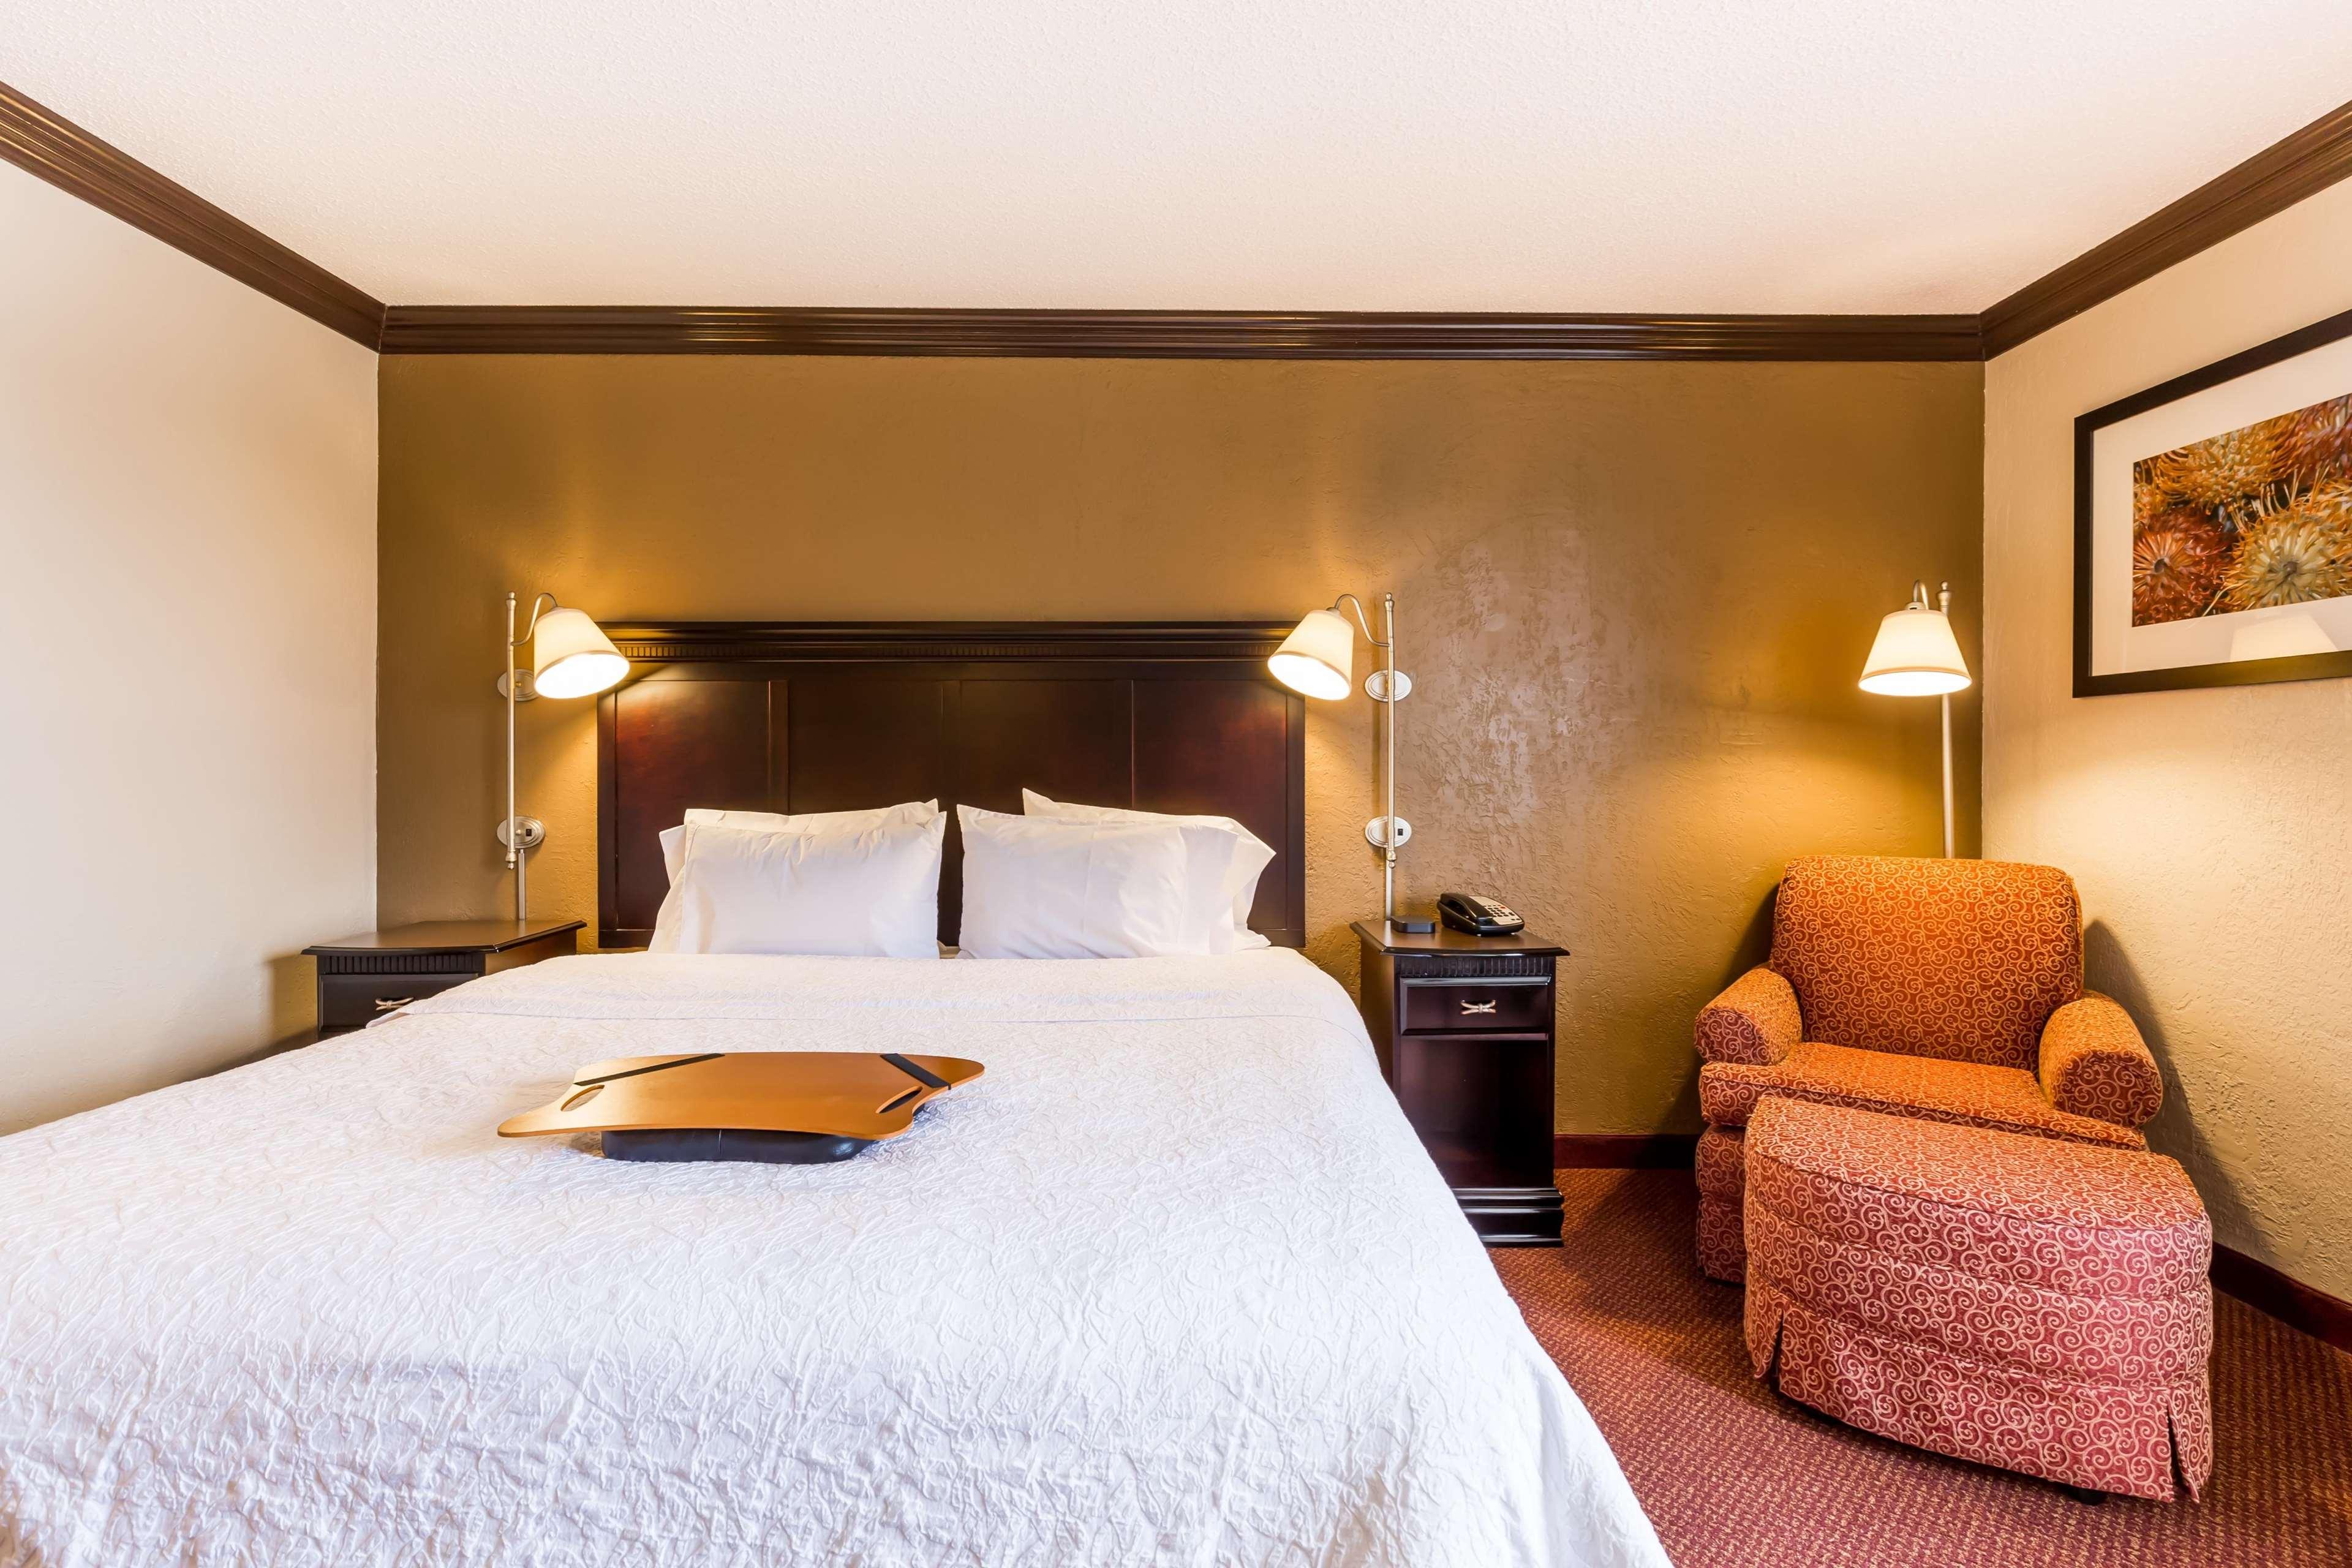 Hampton Inn & Suites Chicago/Hoffman Estates image 41